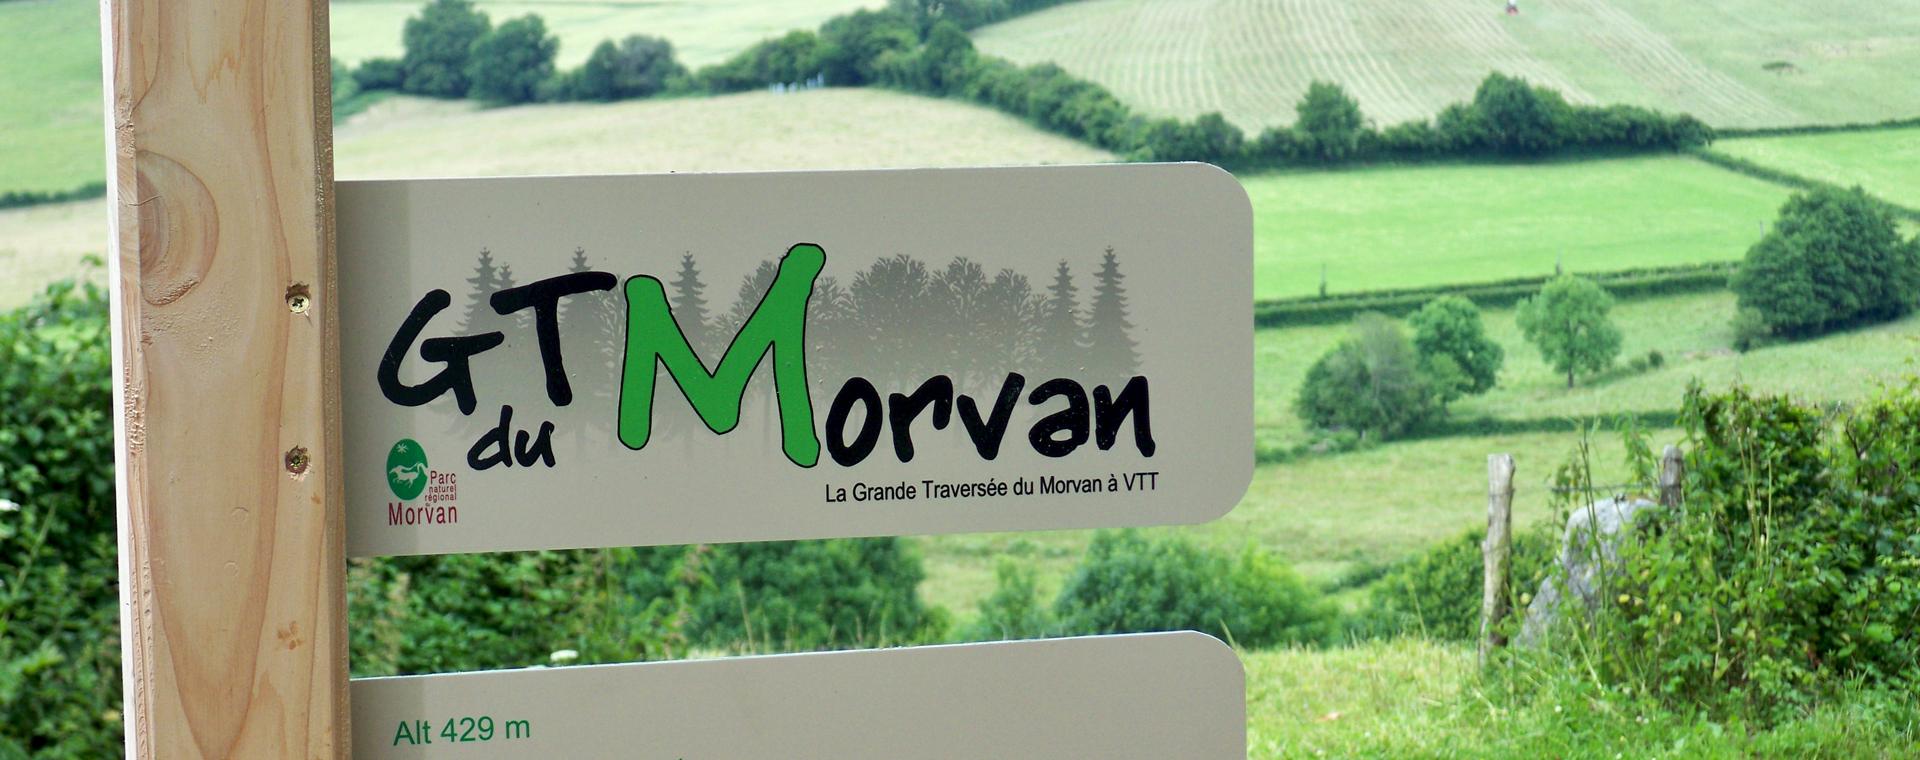 Image La Grande Traversée du Morvan à VTT